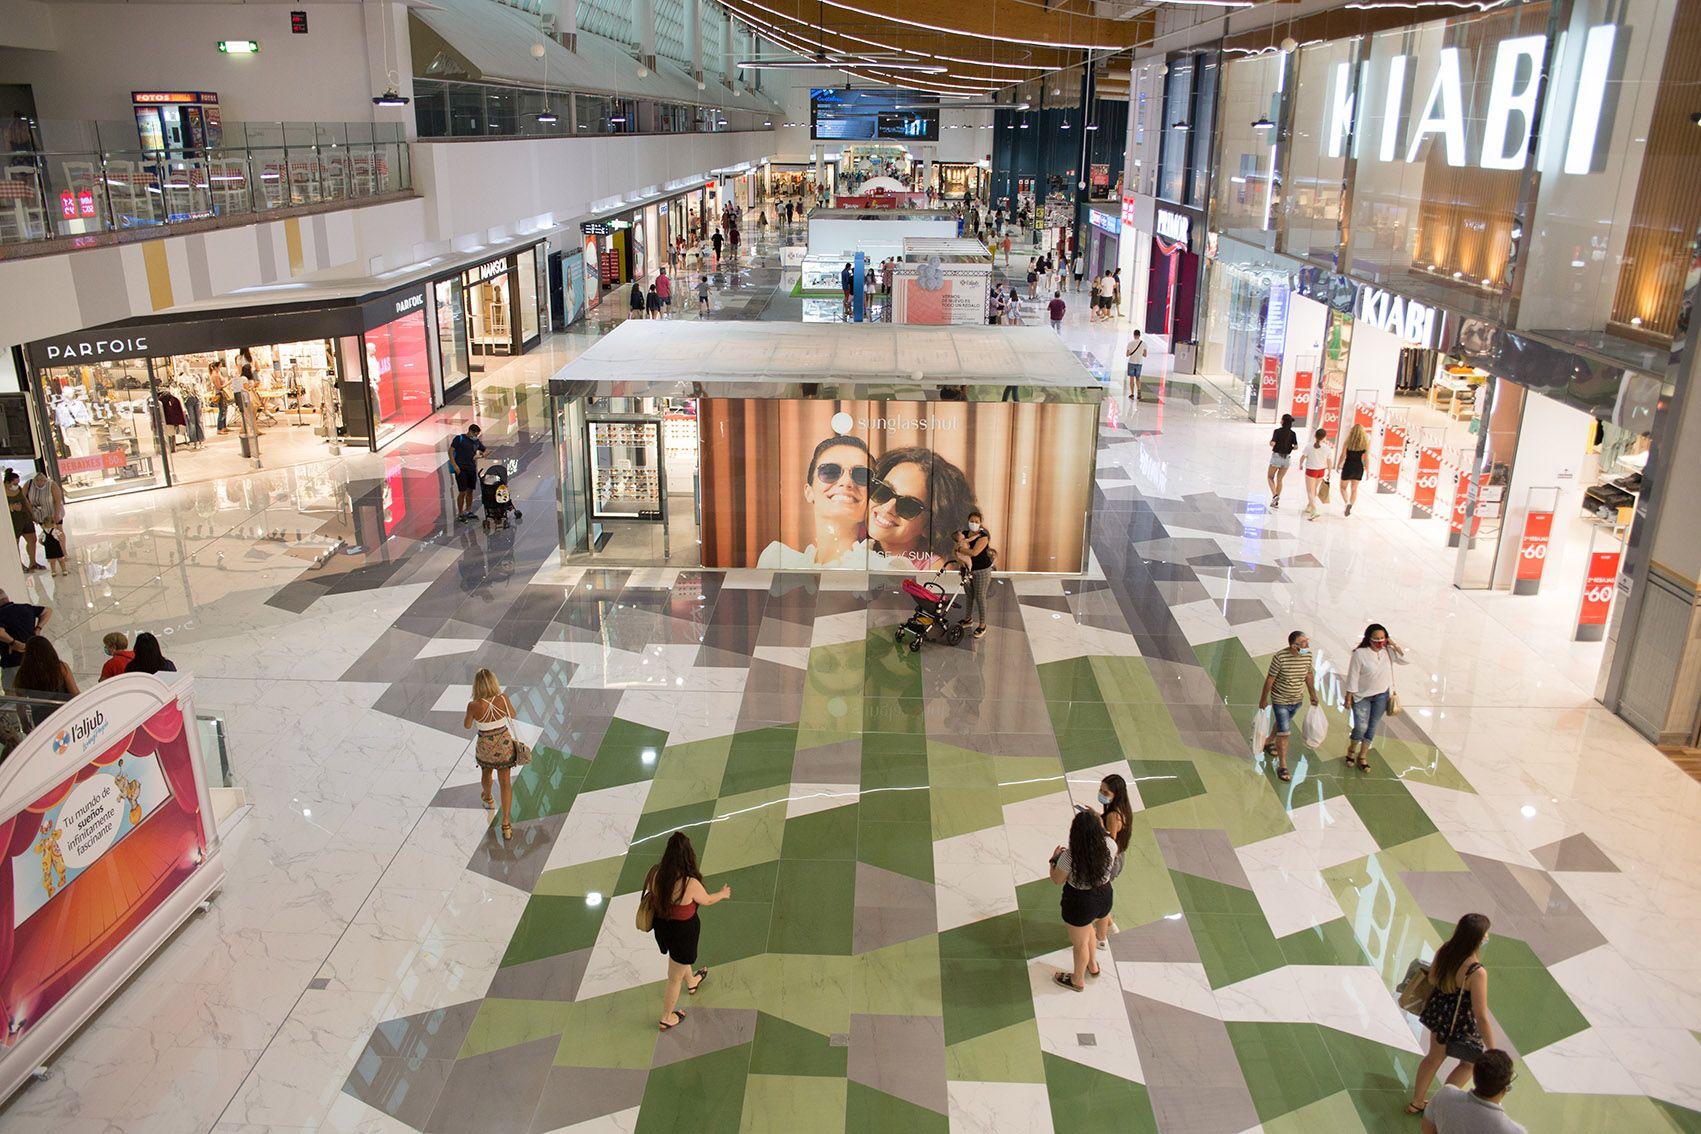 Foto de Reforma Centro Comercial L'Aljub.